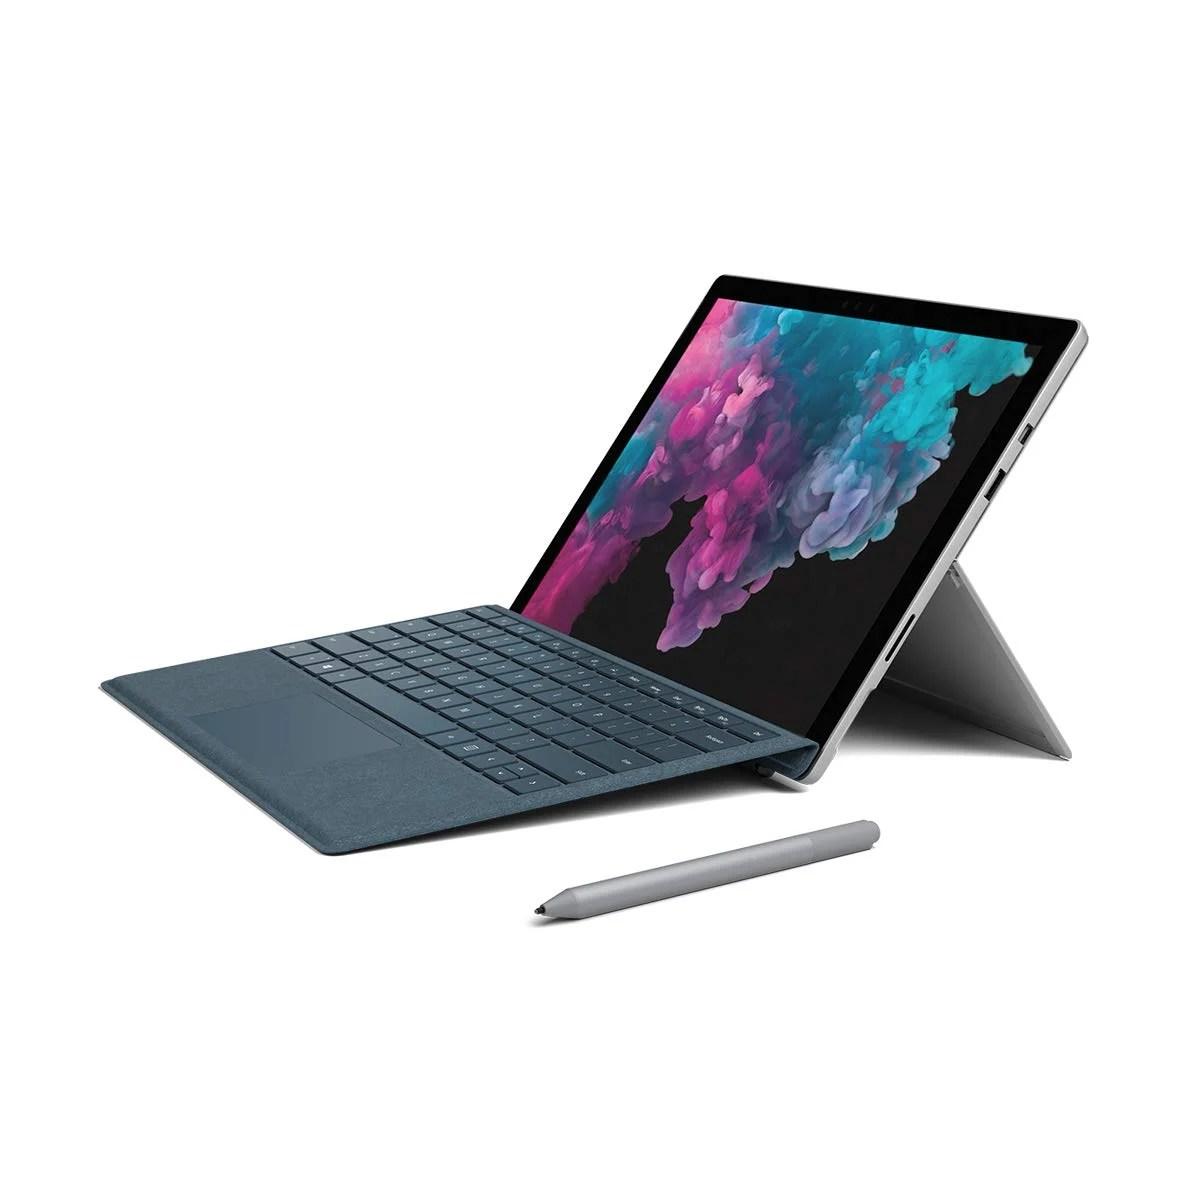 🔥 Prime Day 2019 : la dernière Microsoft Surface Pro tombe à 699 euros